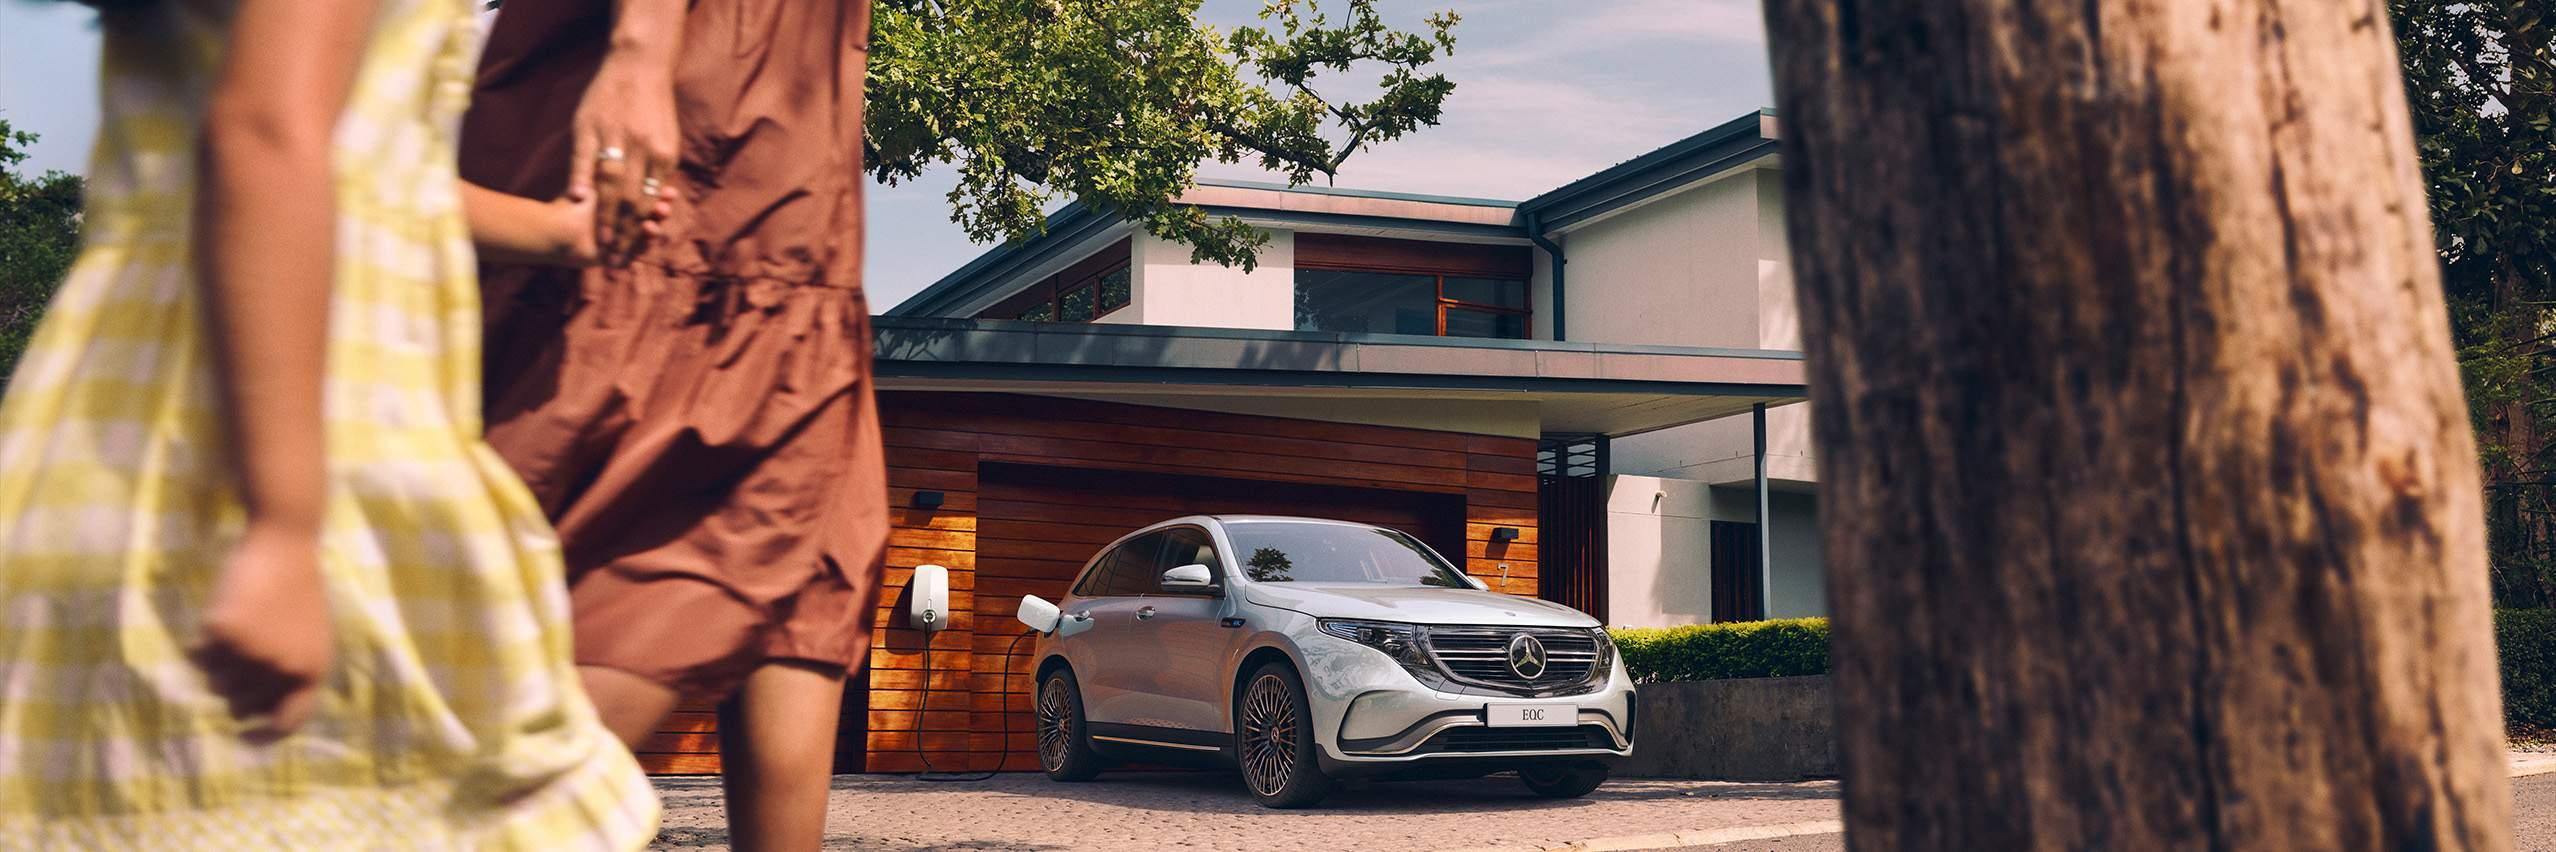 CAR-Avenue-Mercedes-EQC-SUV-07